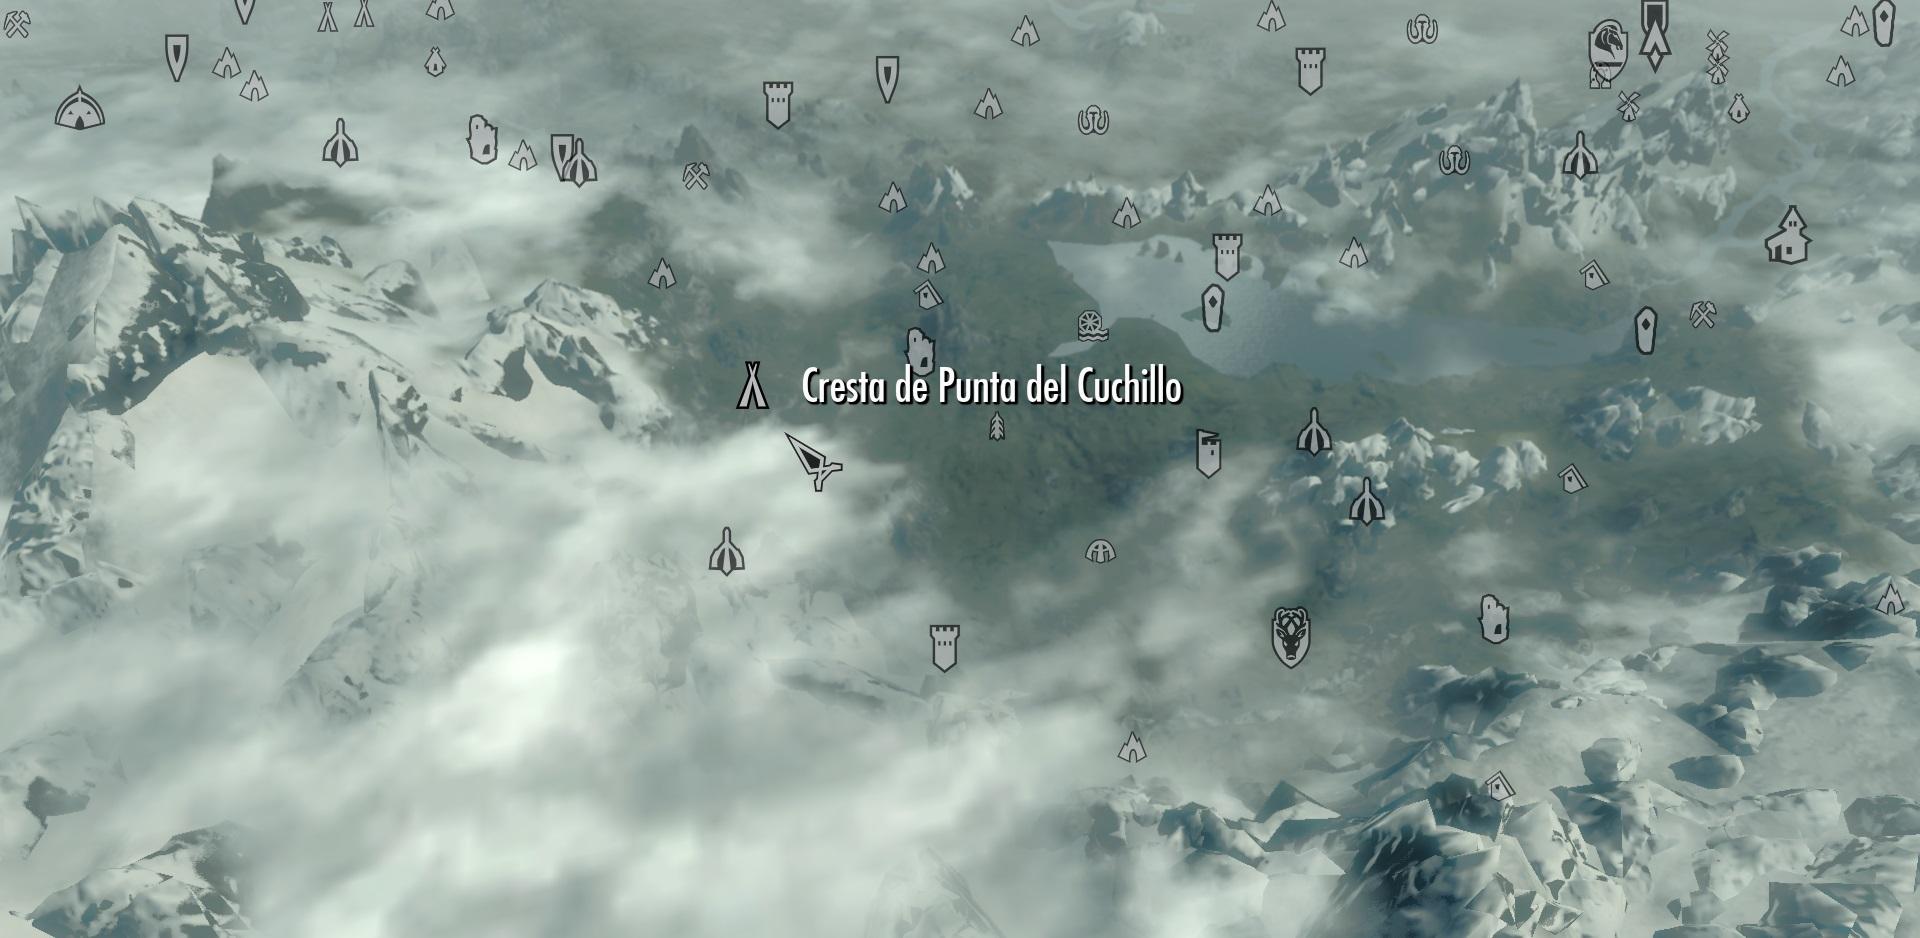 Cresta de Punta del Cuchillo